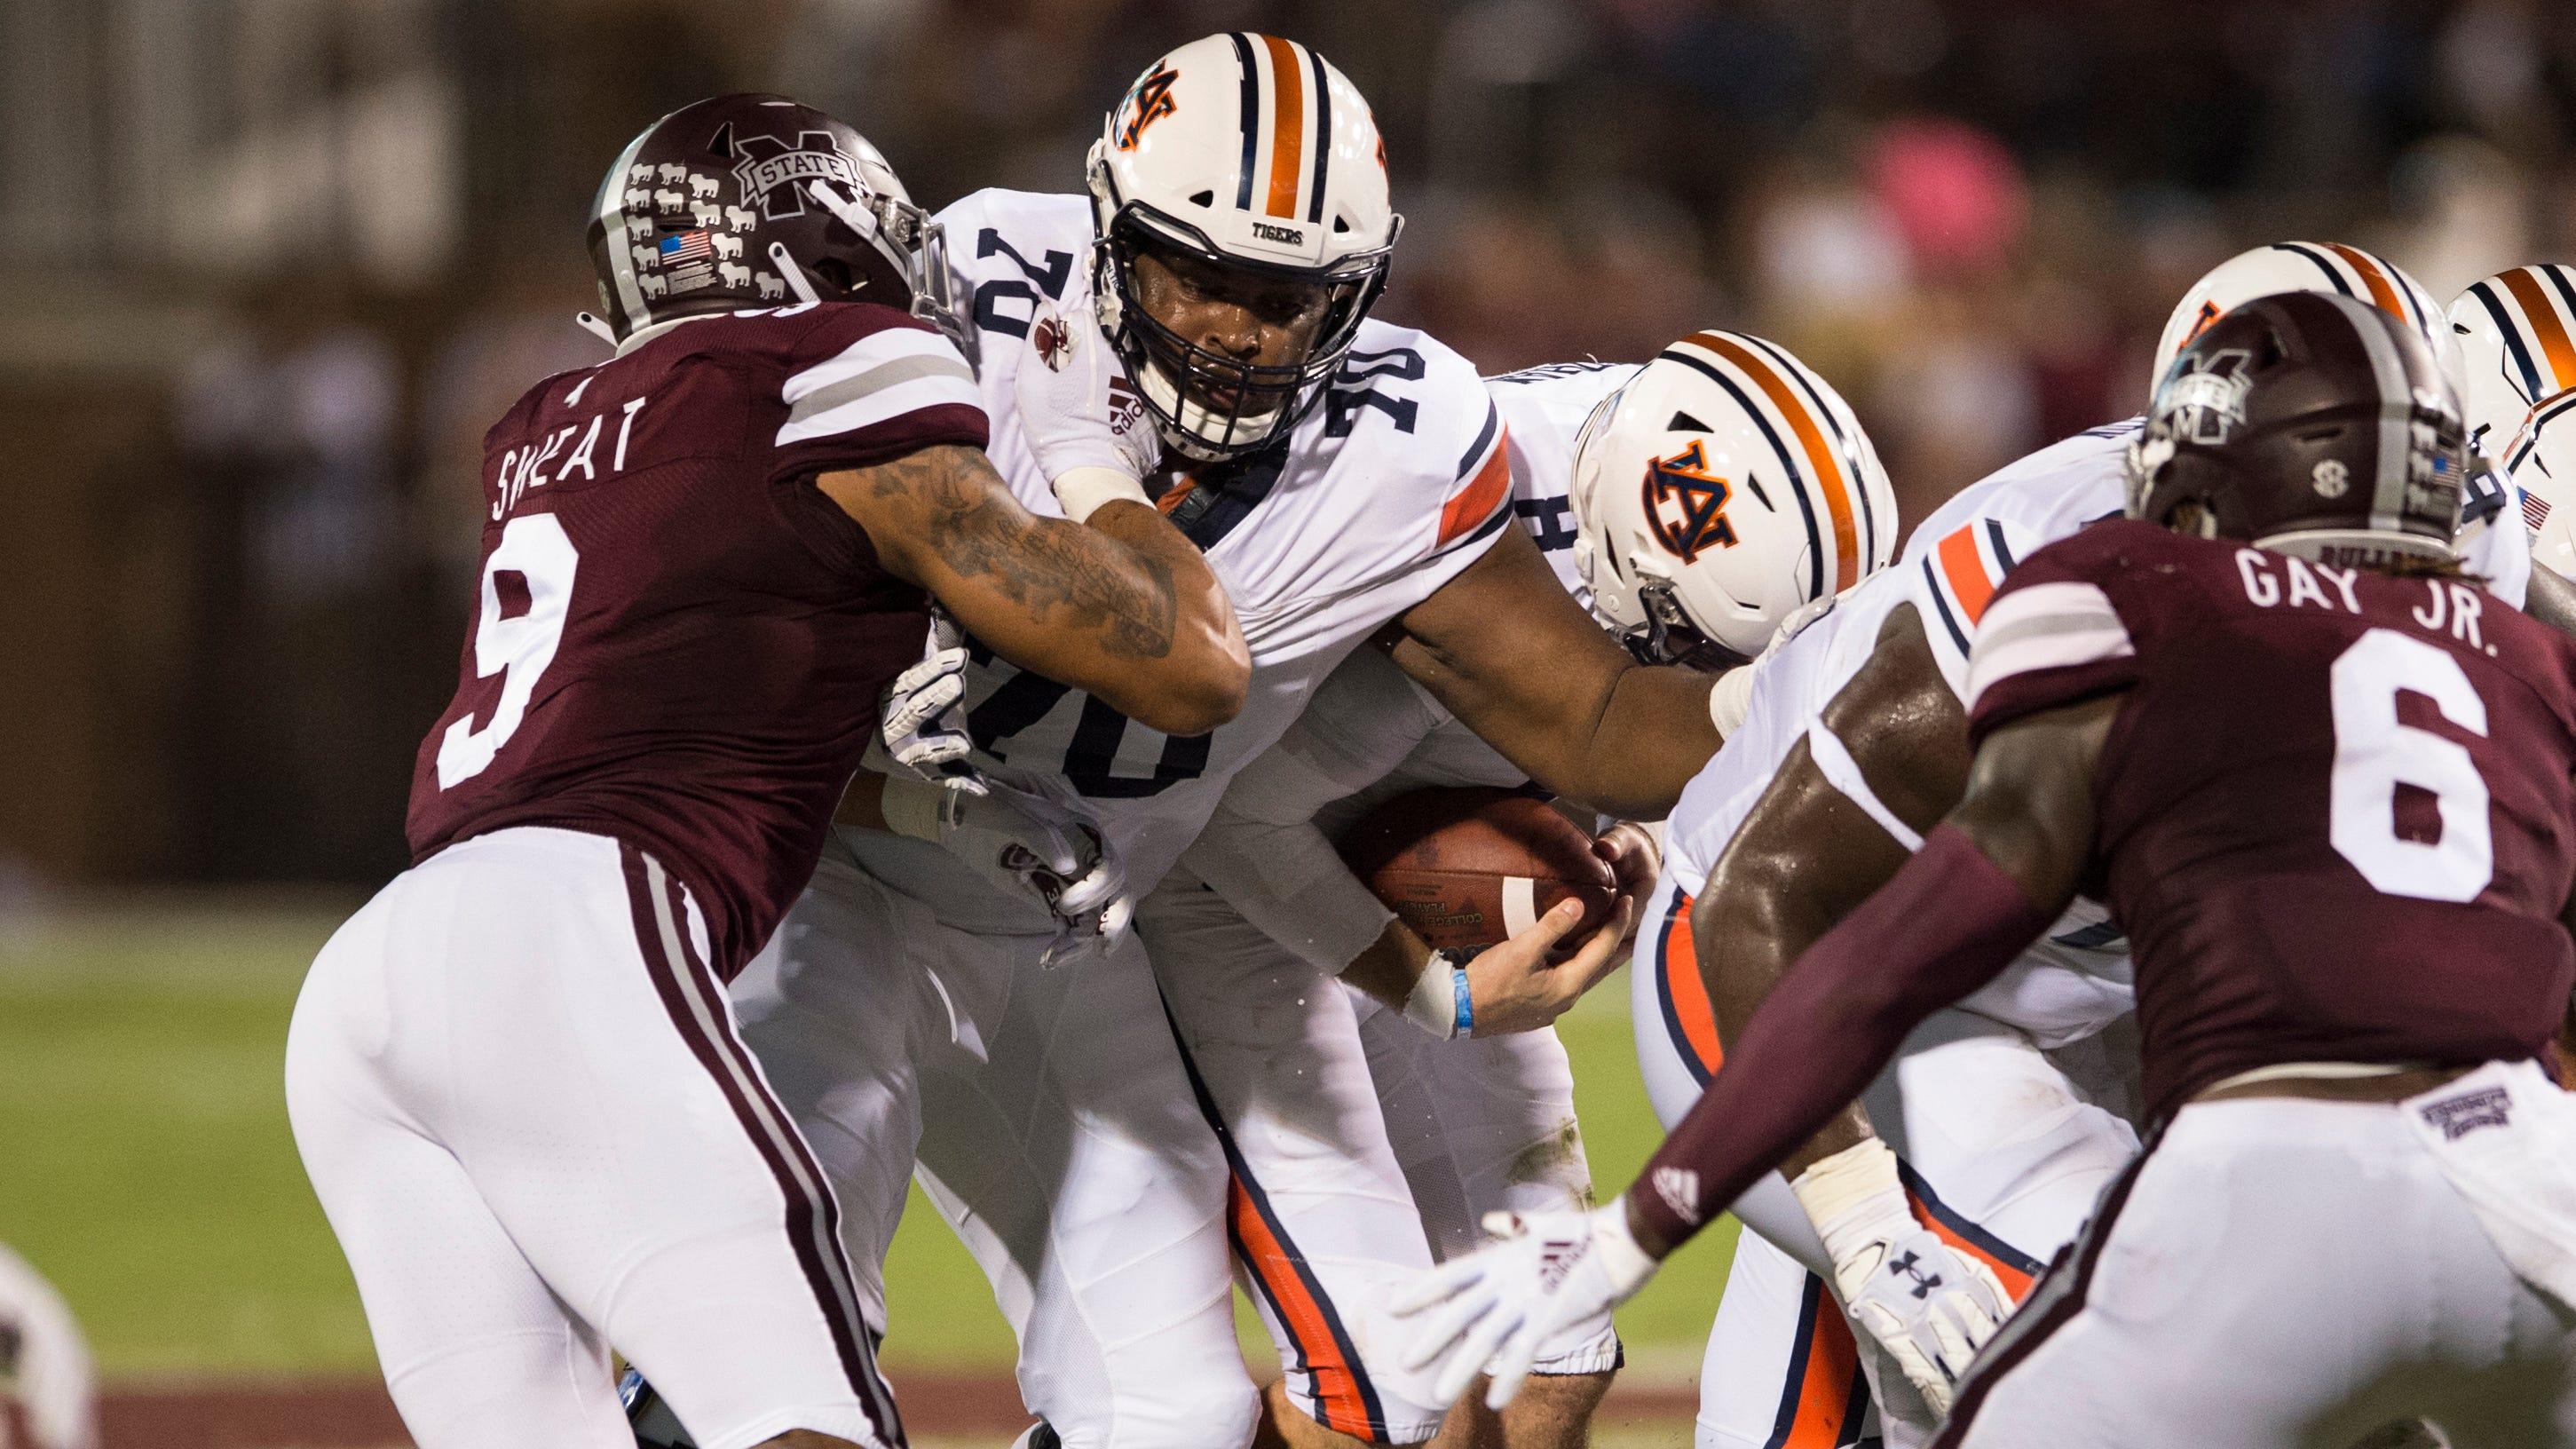 Auburn Football Bleacher Report Latest News Scores Stats And